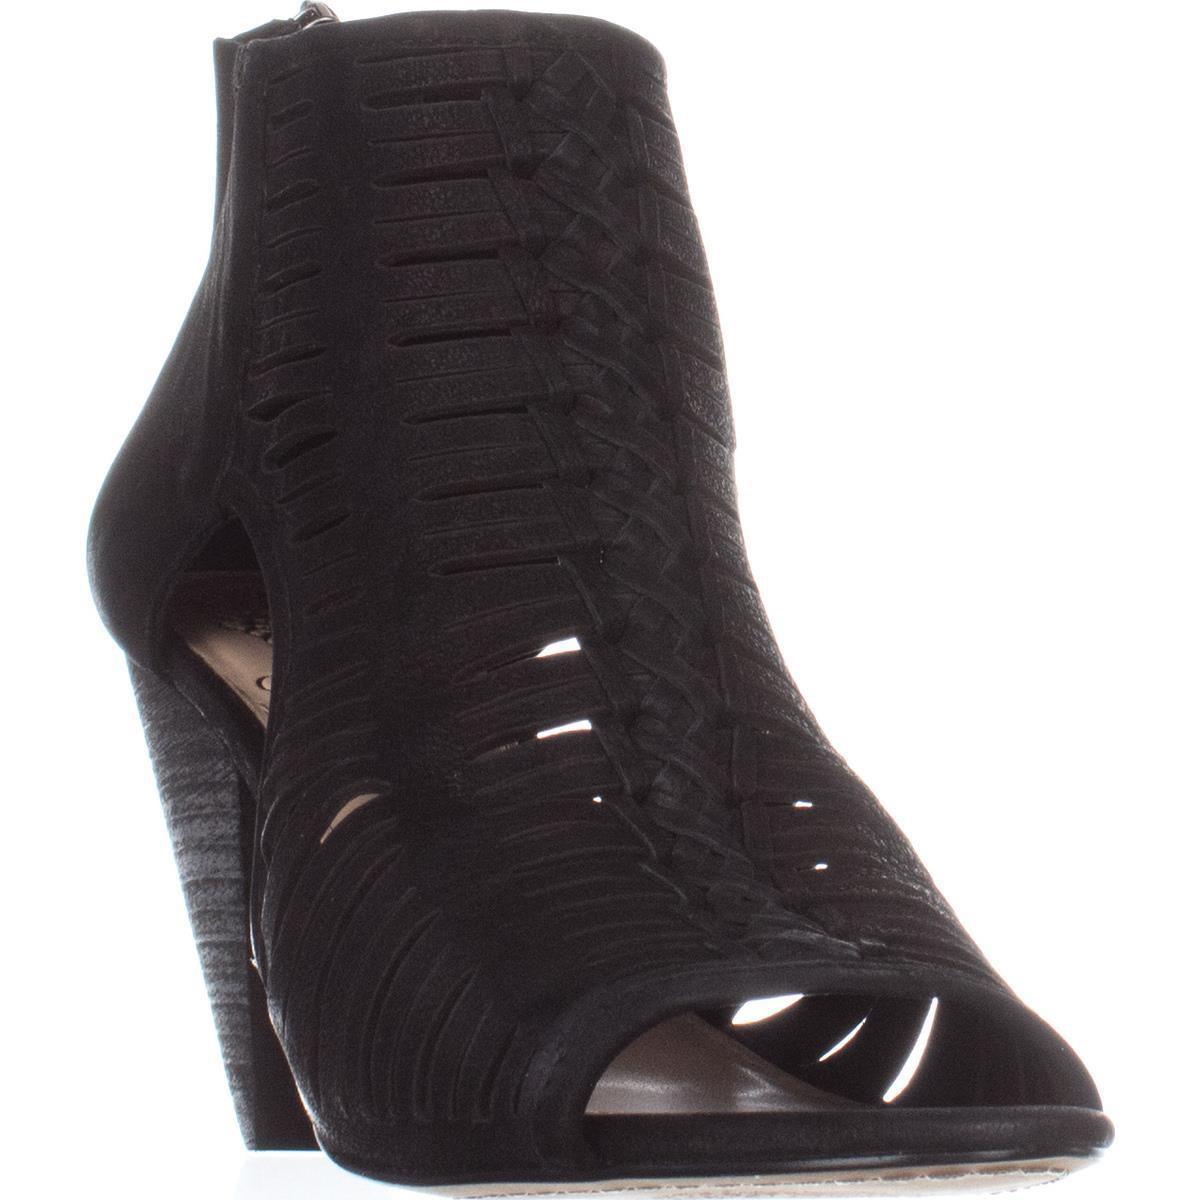 9bde515c1a21 Lyst - Vince Camuto Eldora Peep Toe Heeled Sandals